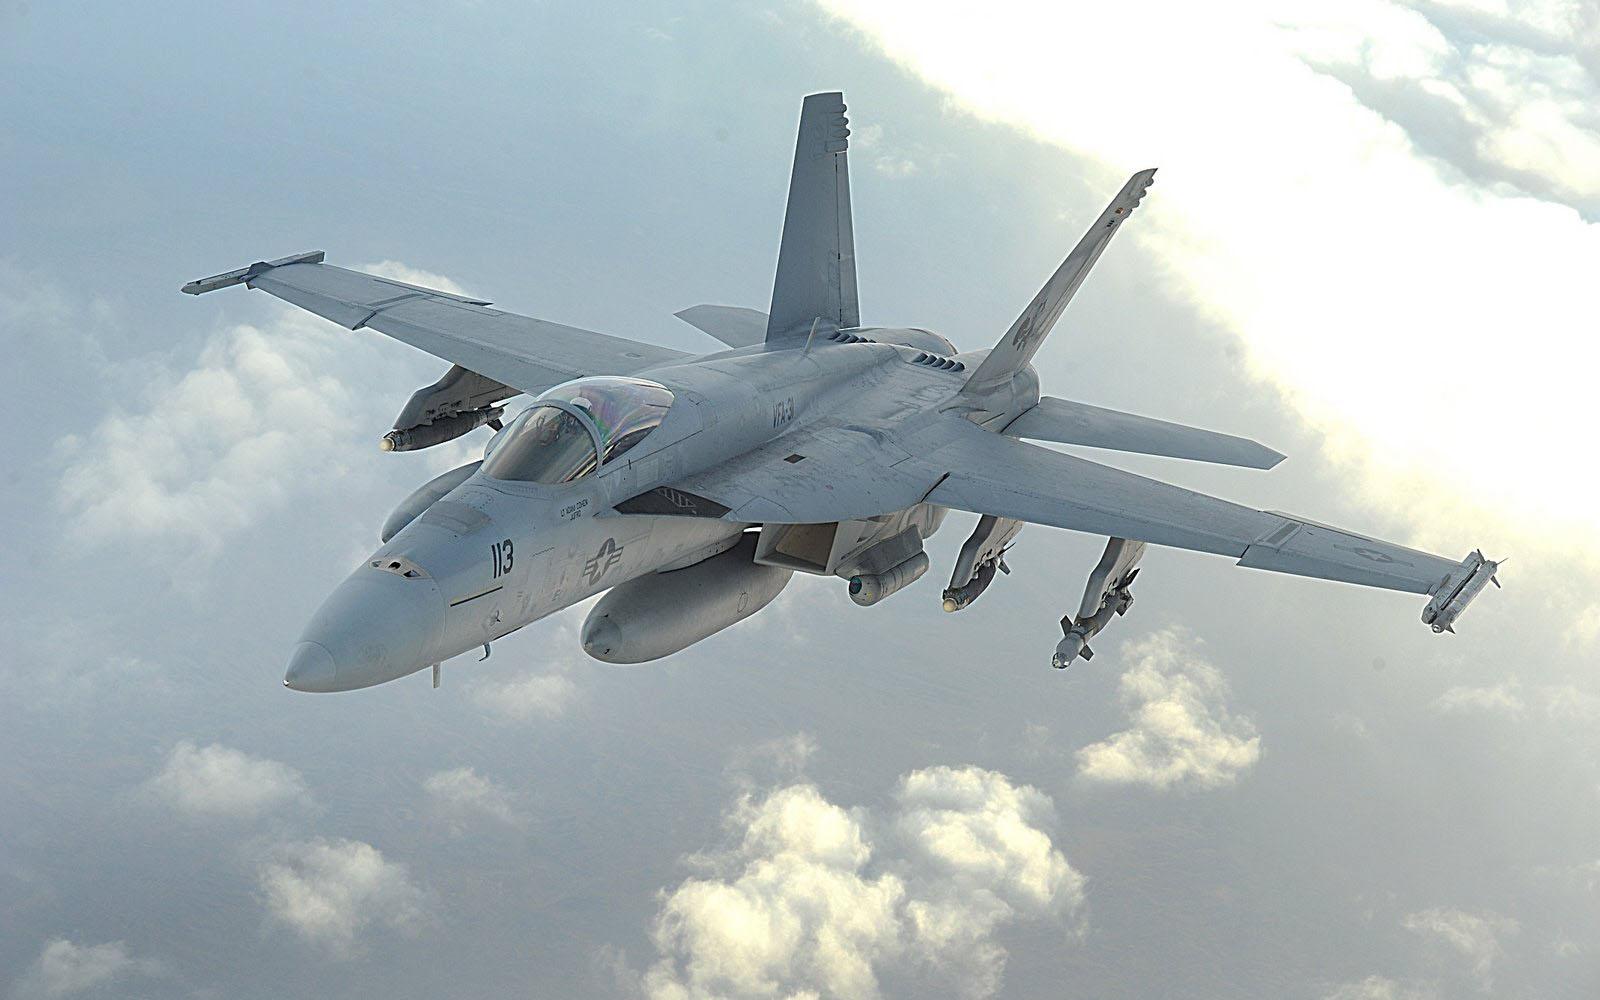 F 18 Advanced Super Hornet F A-18F Super Hornet A...